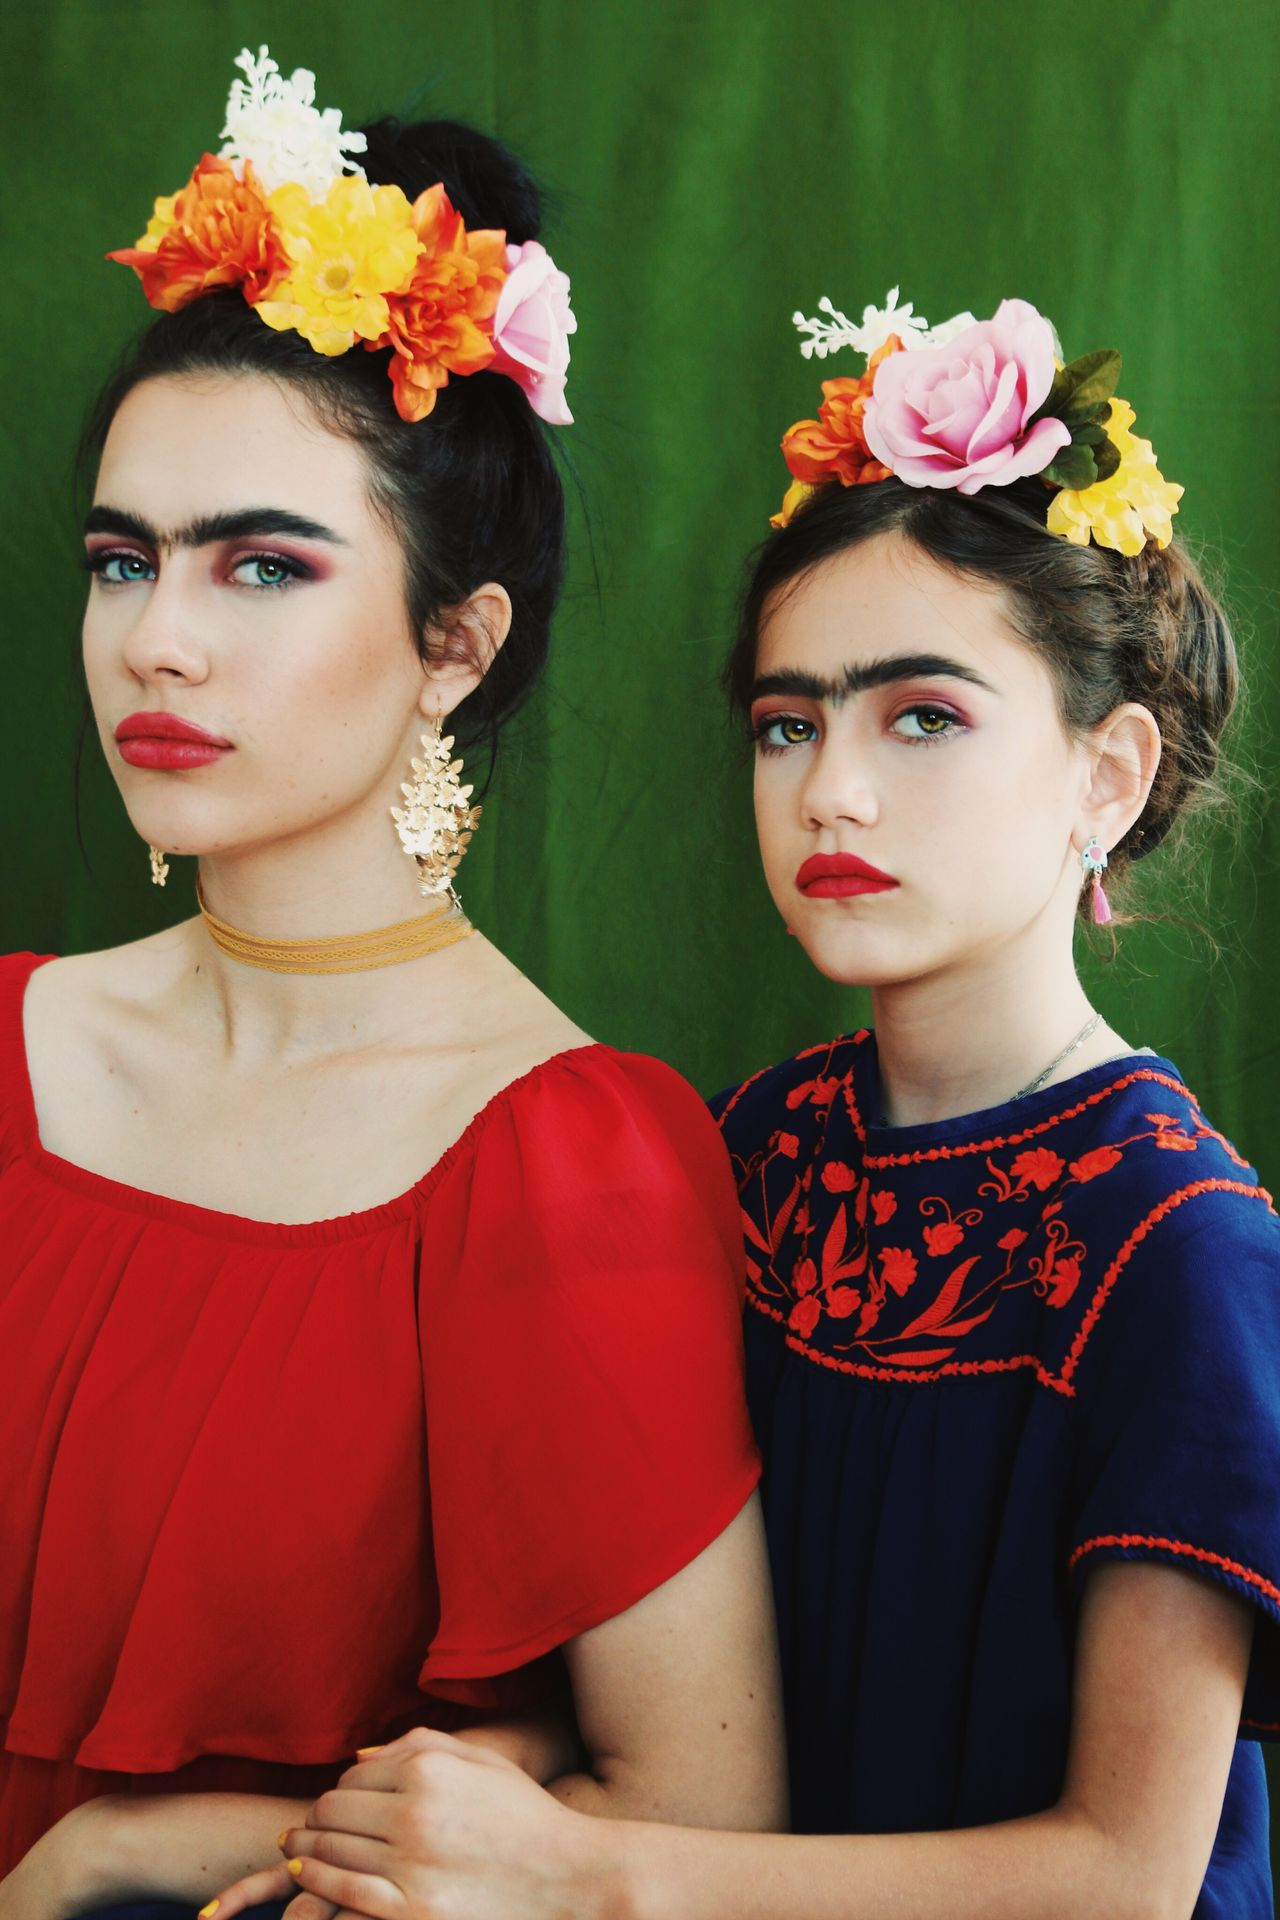 Portrait of women wearing flowers on hair against curtain